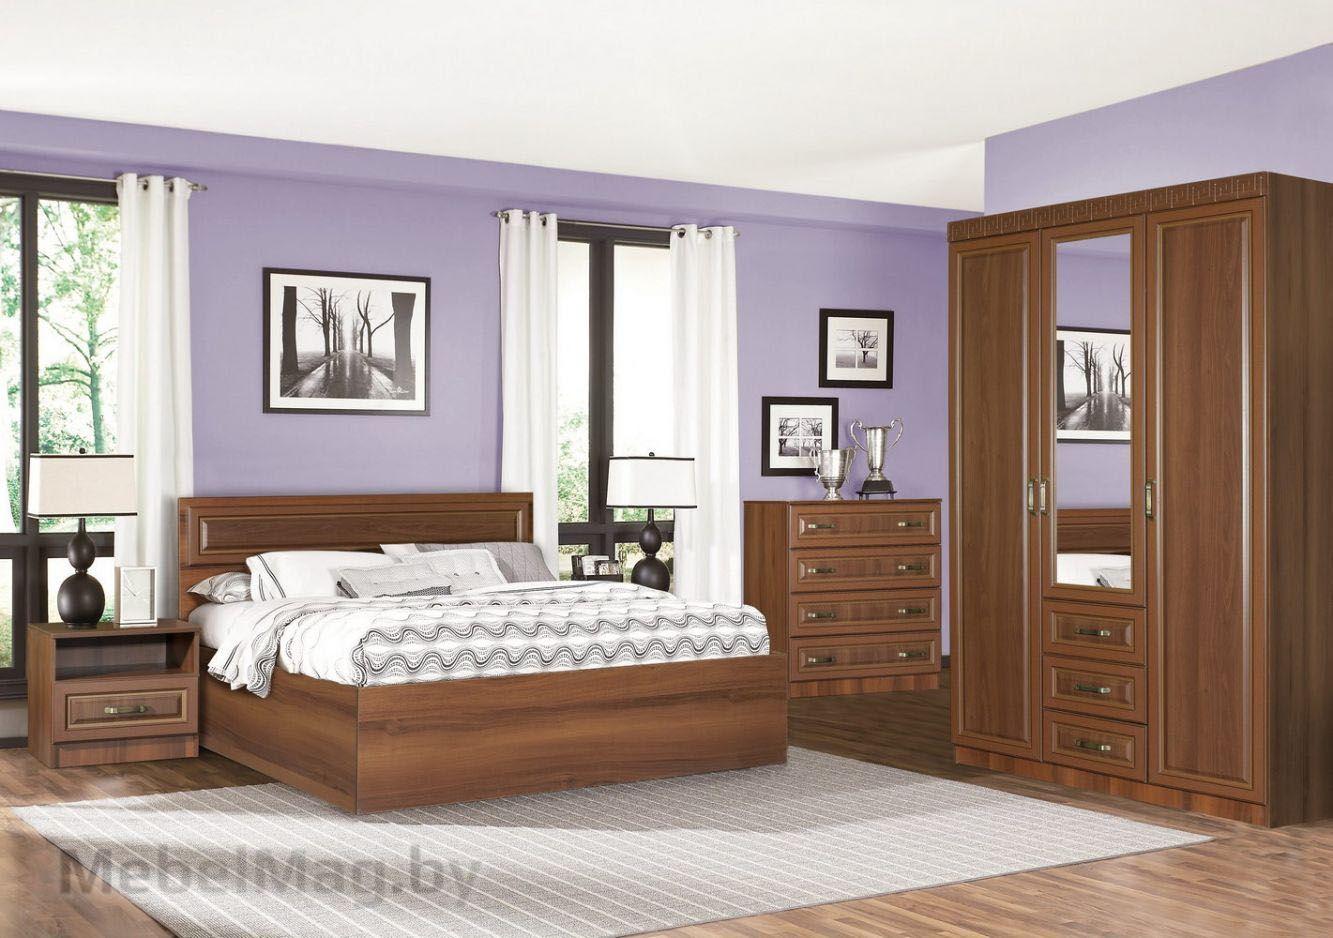 Спальня Линда